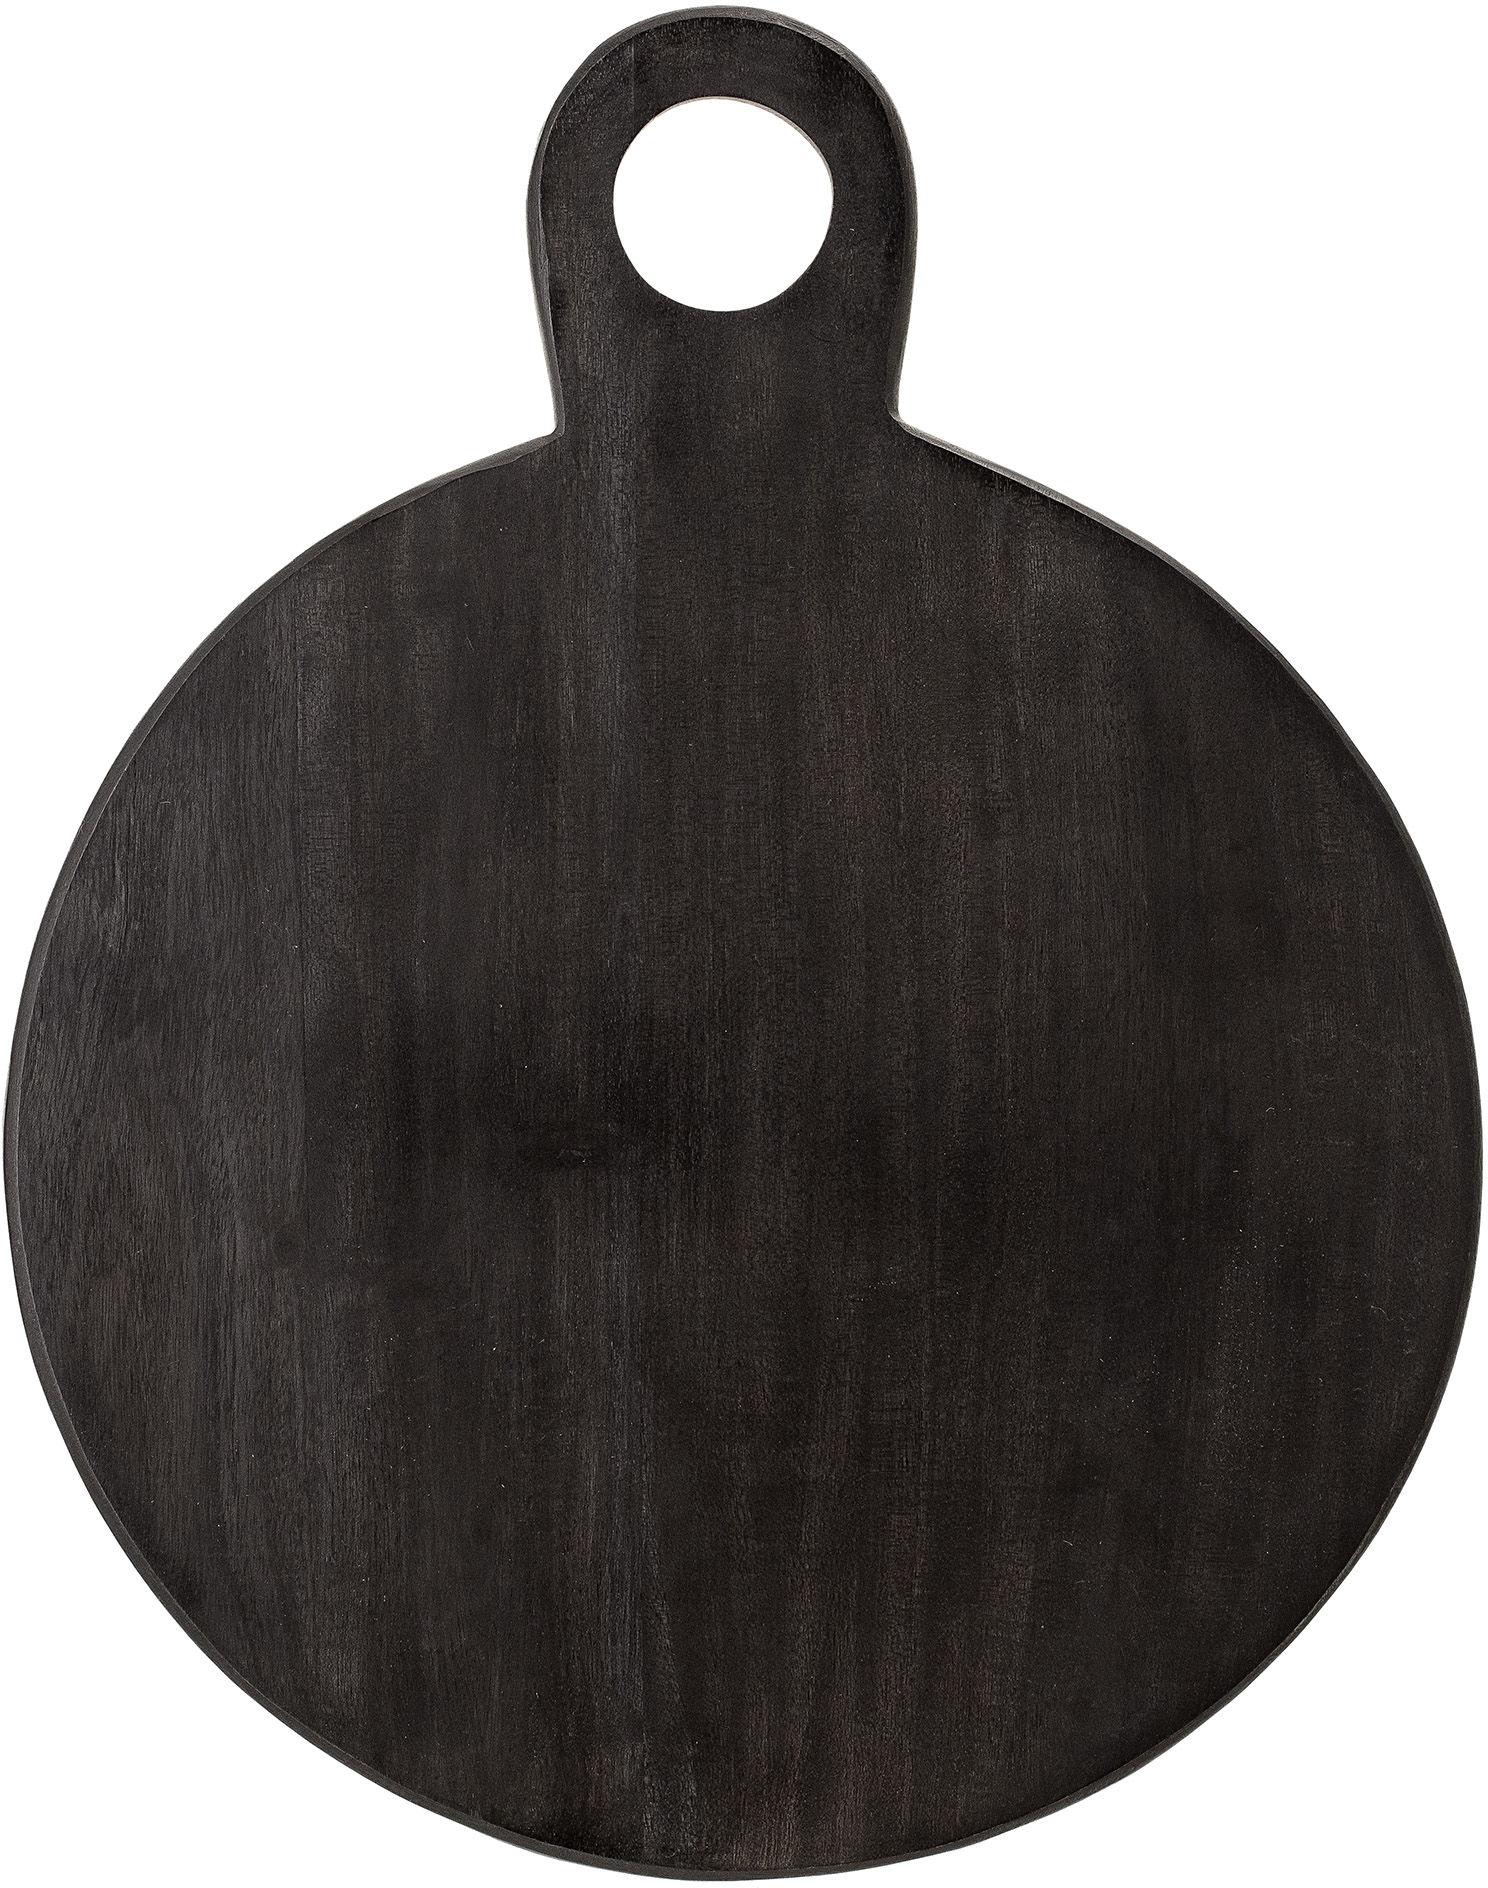 Deska Akacjowa Bloomingville Czarna Okrągła